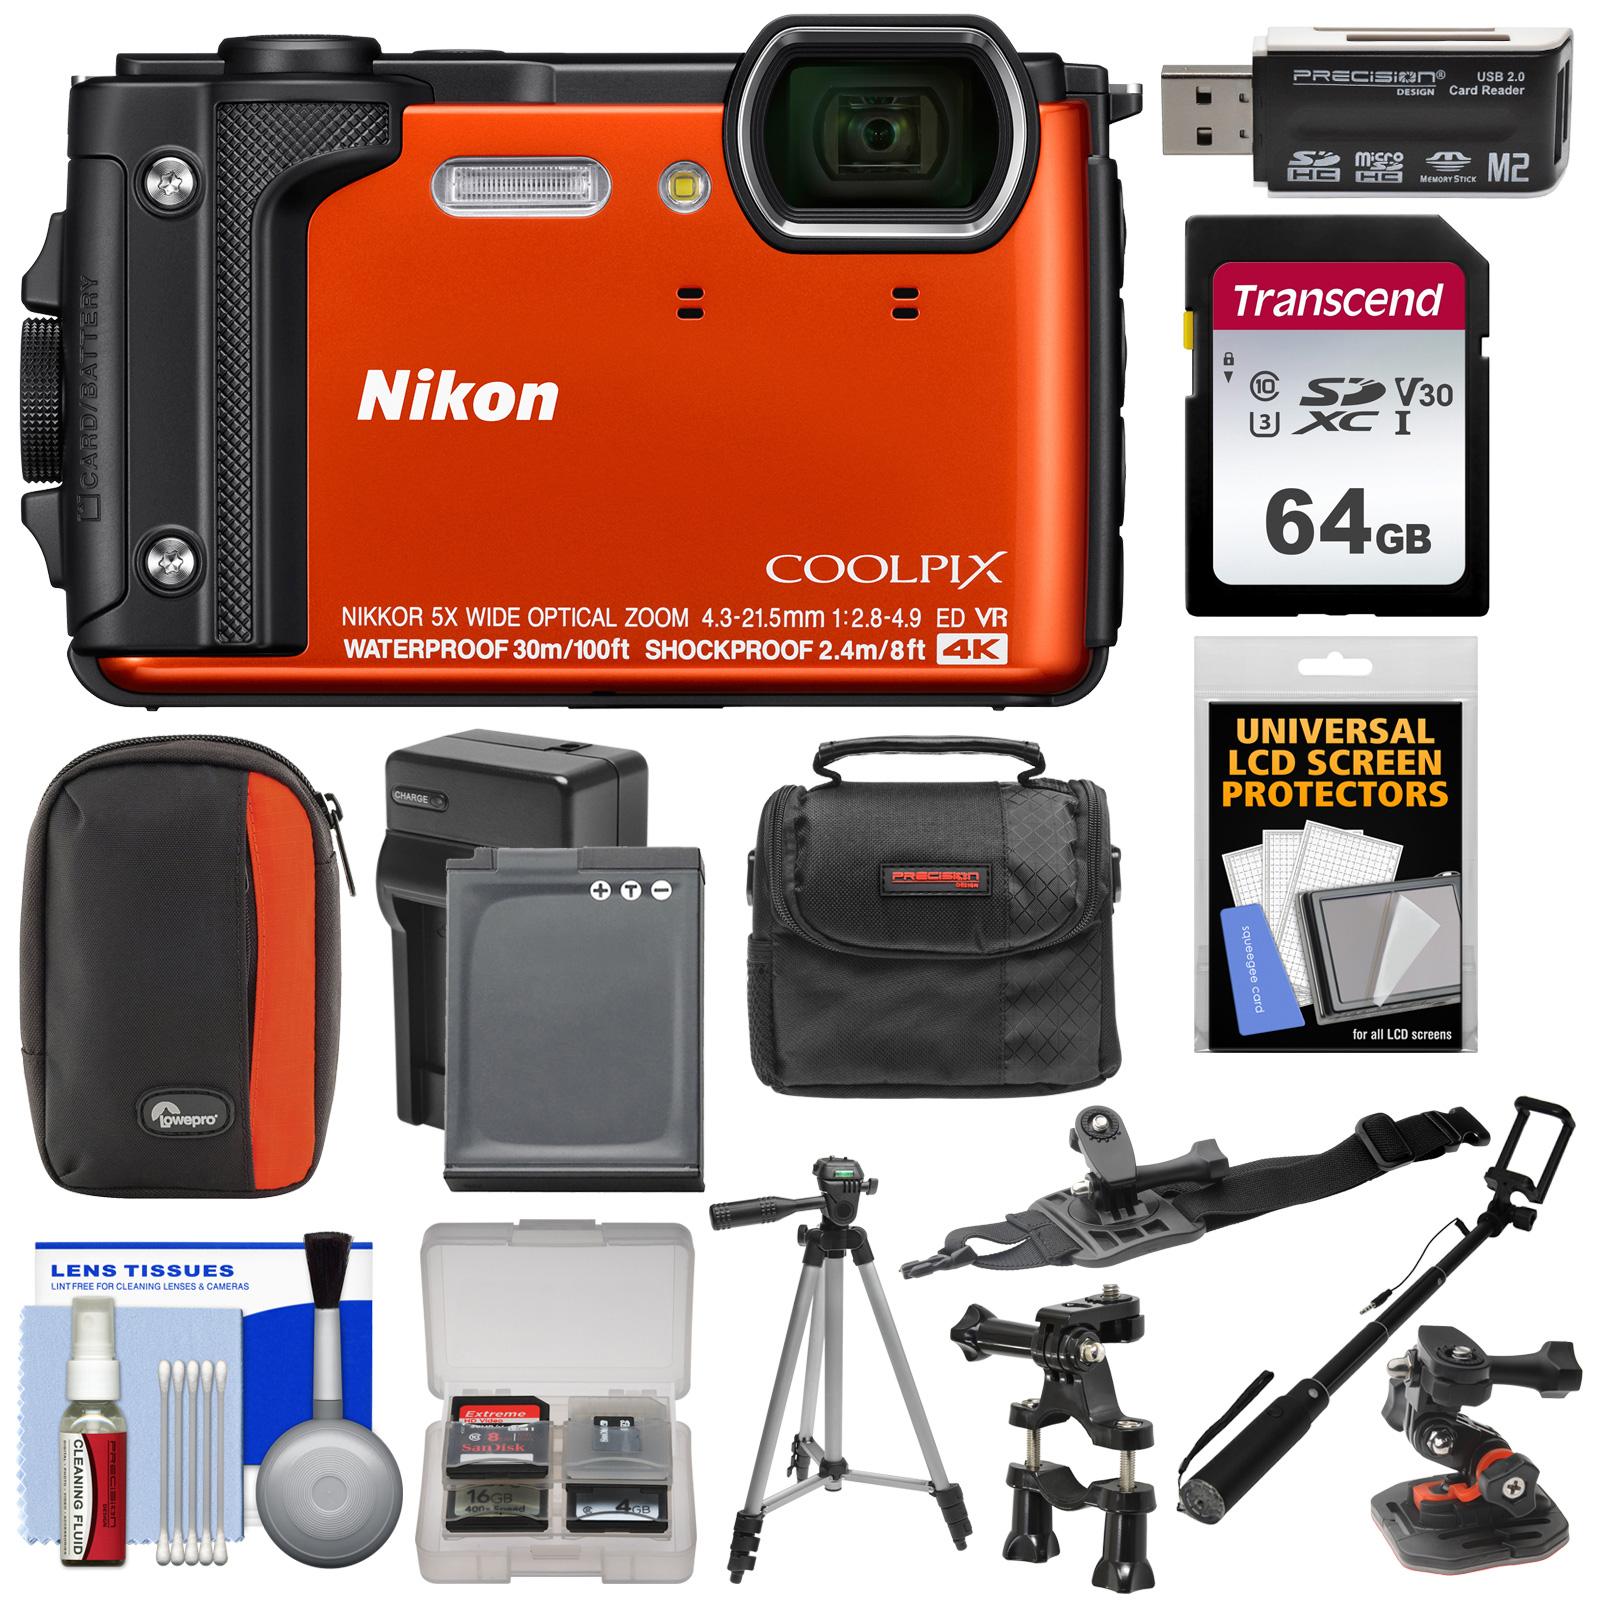 Nikon Coolpix W300 4K Wi-Fi Shock + Waterproof Digital Camera (Orange) with 64GB Card + (2) Cases + Battery + Charger + Tripod + Handlebar + Helmet Mounts + Kit